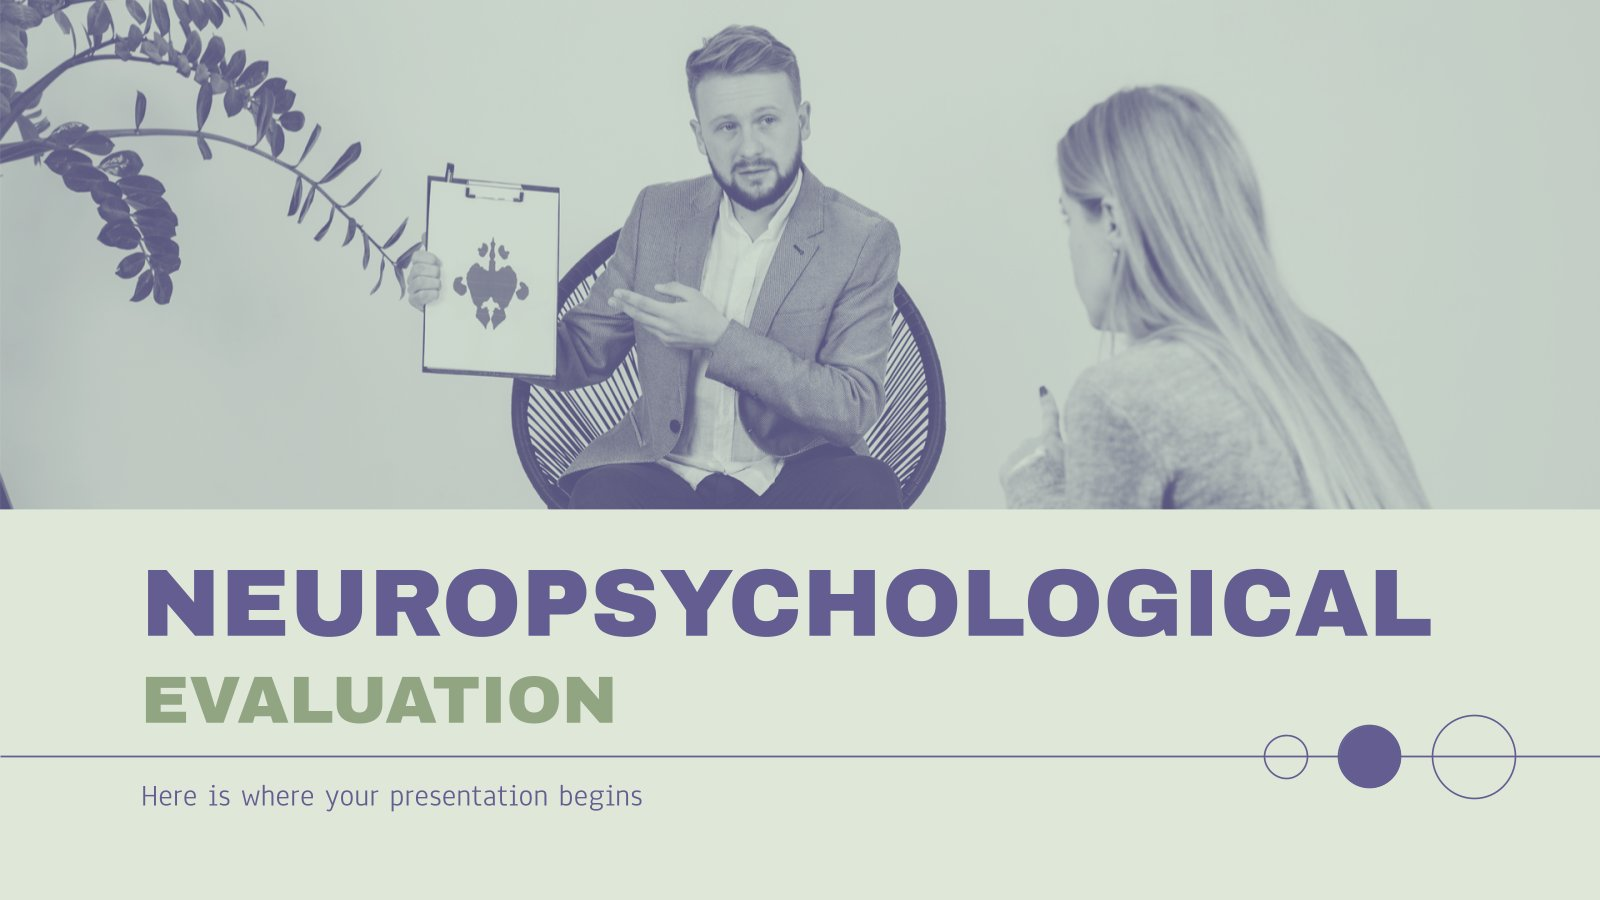 Neuropsychological Evaluation presentation template